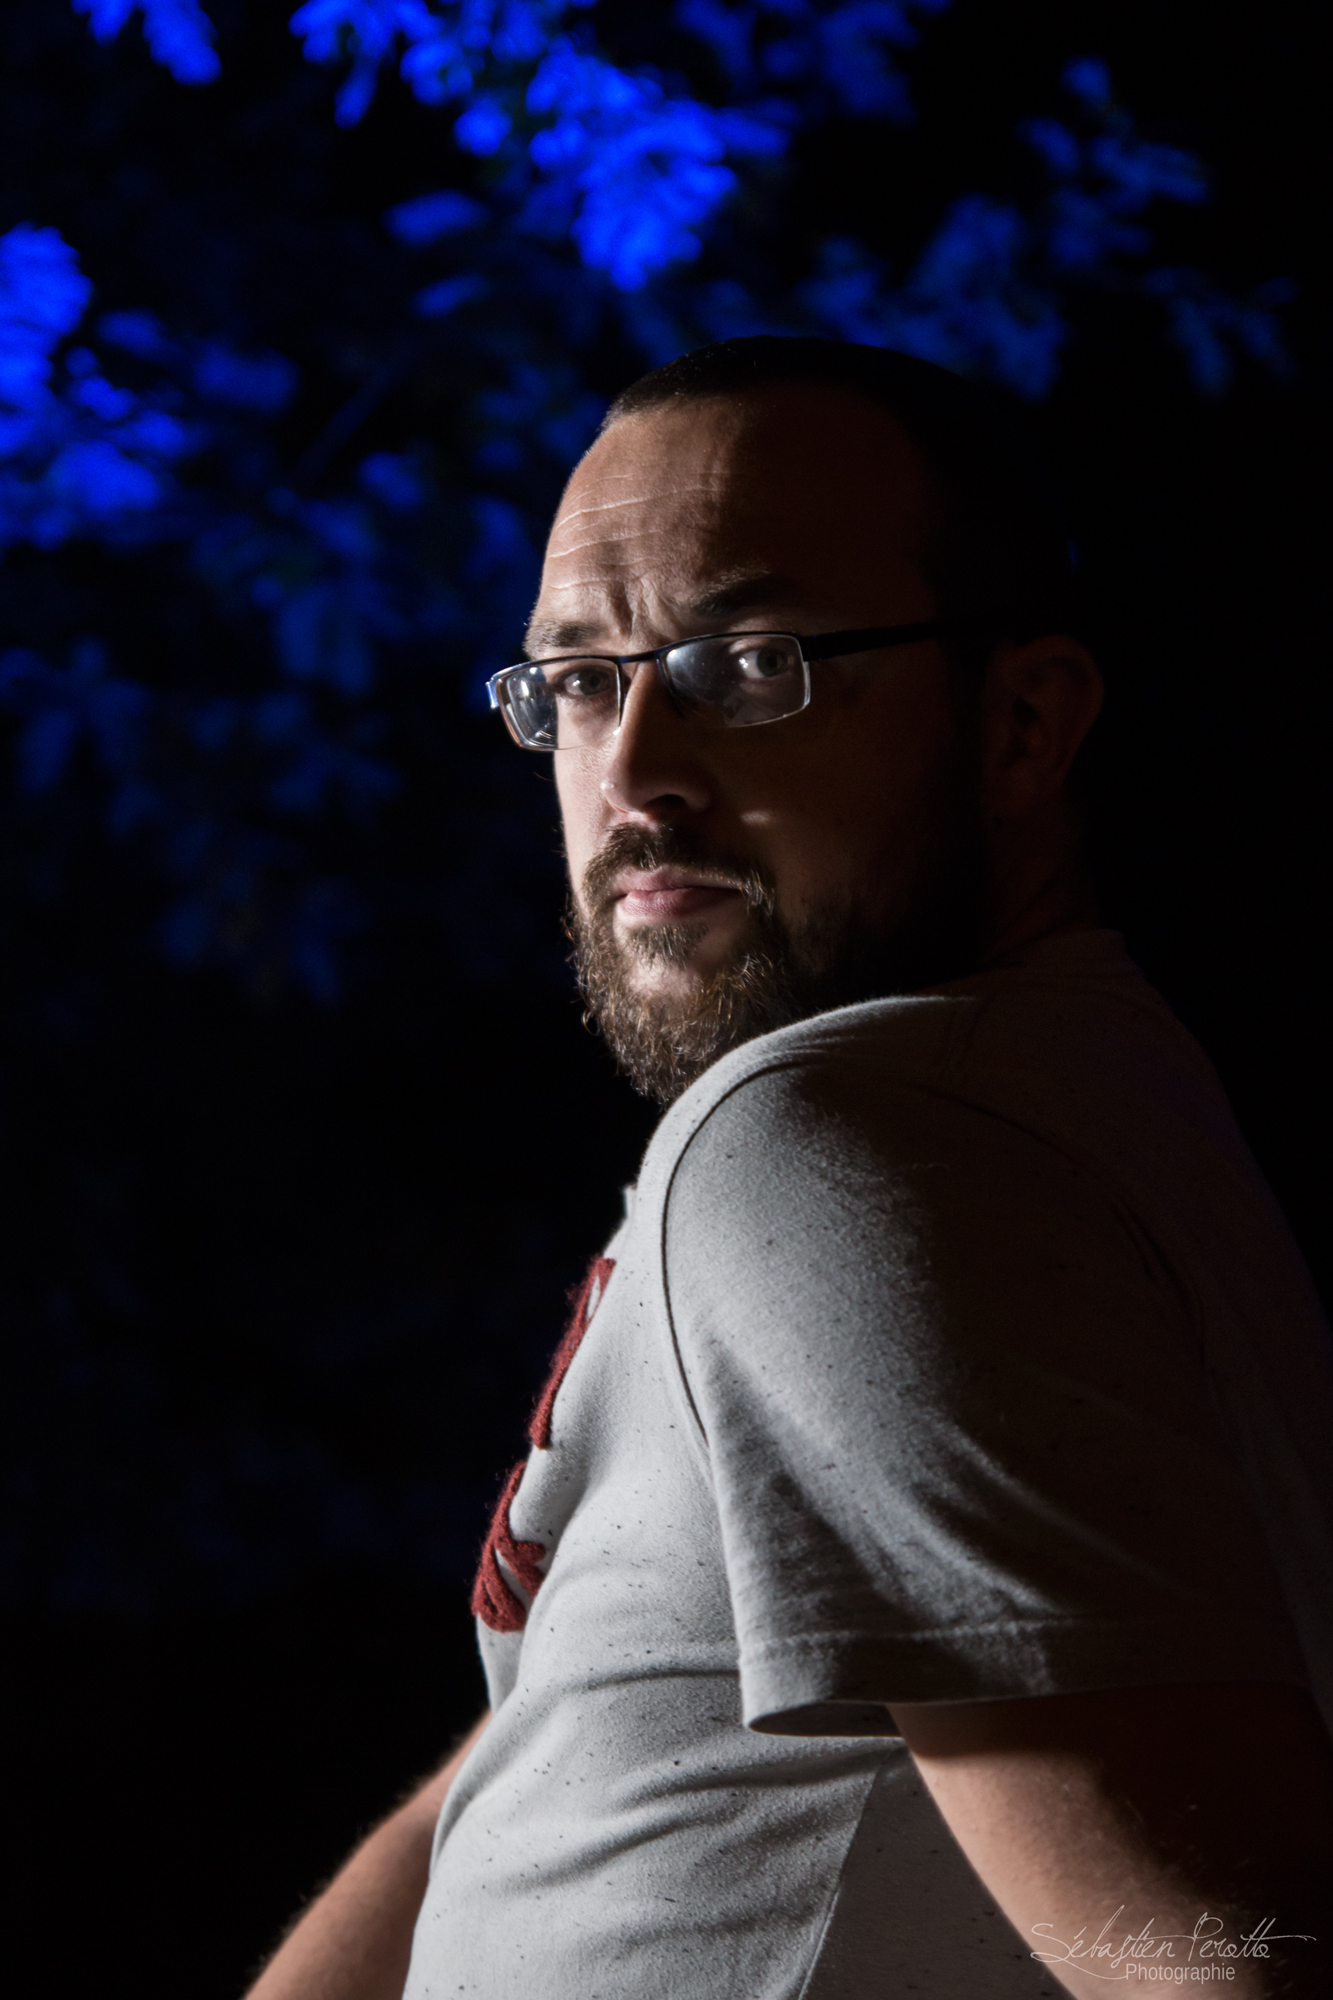 Julien on the night